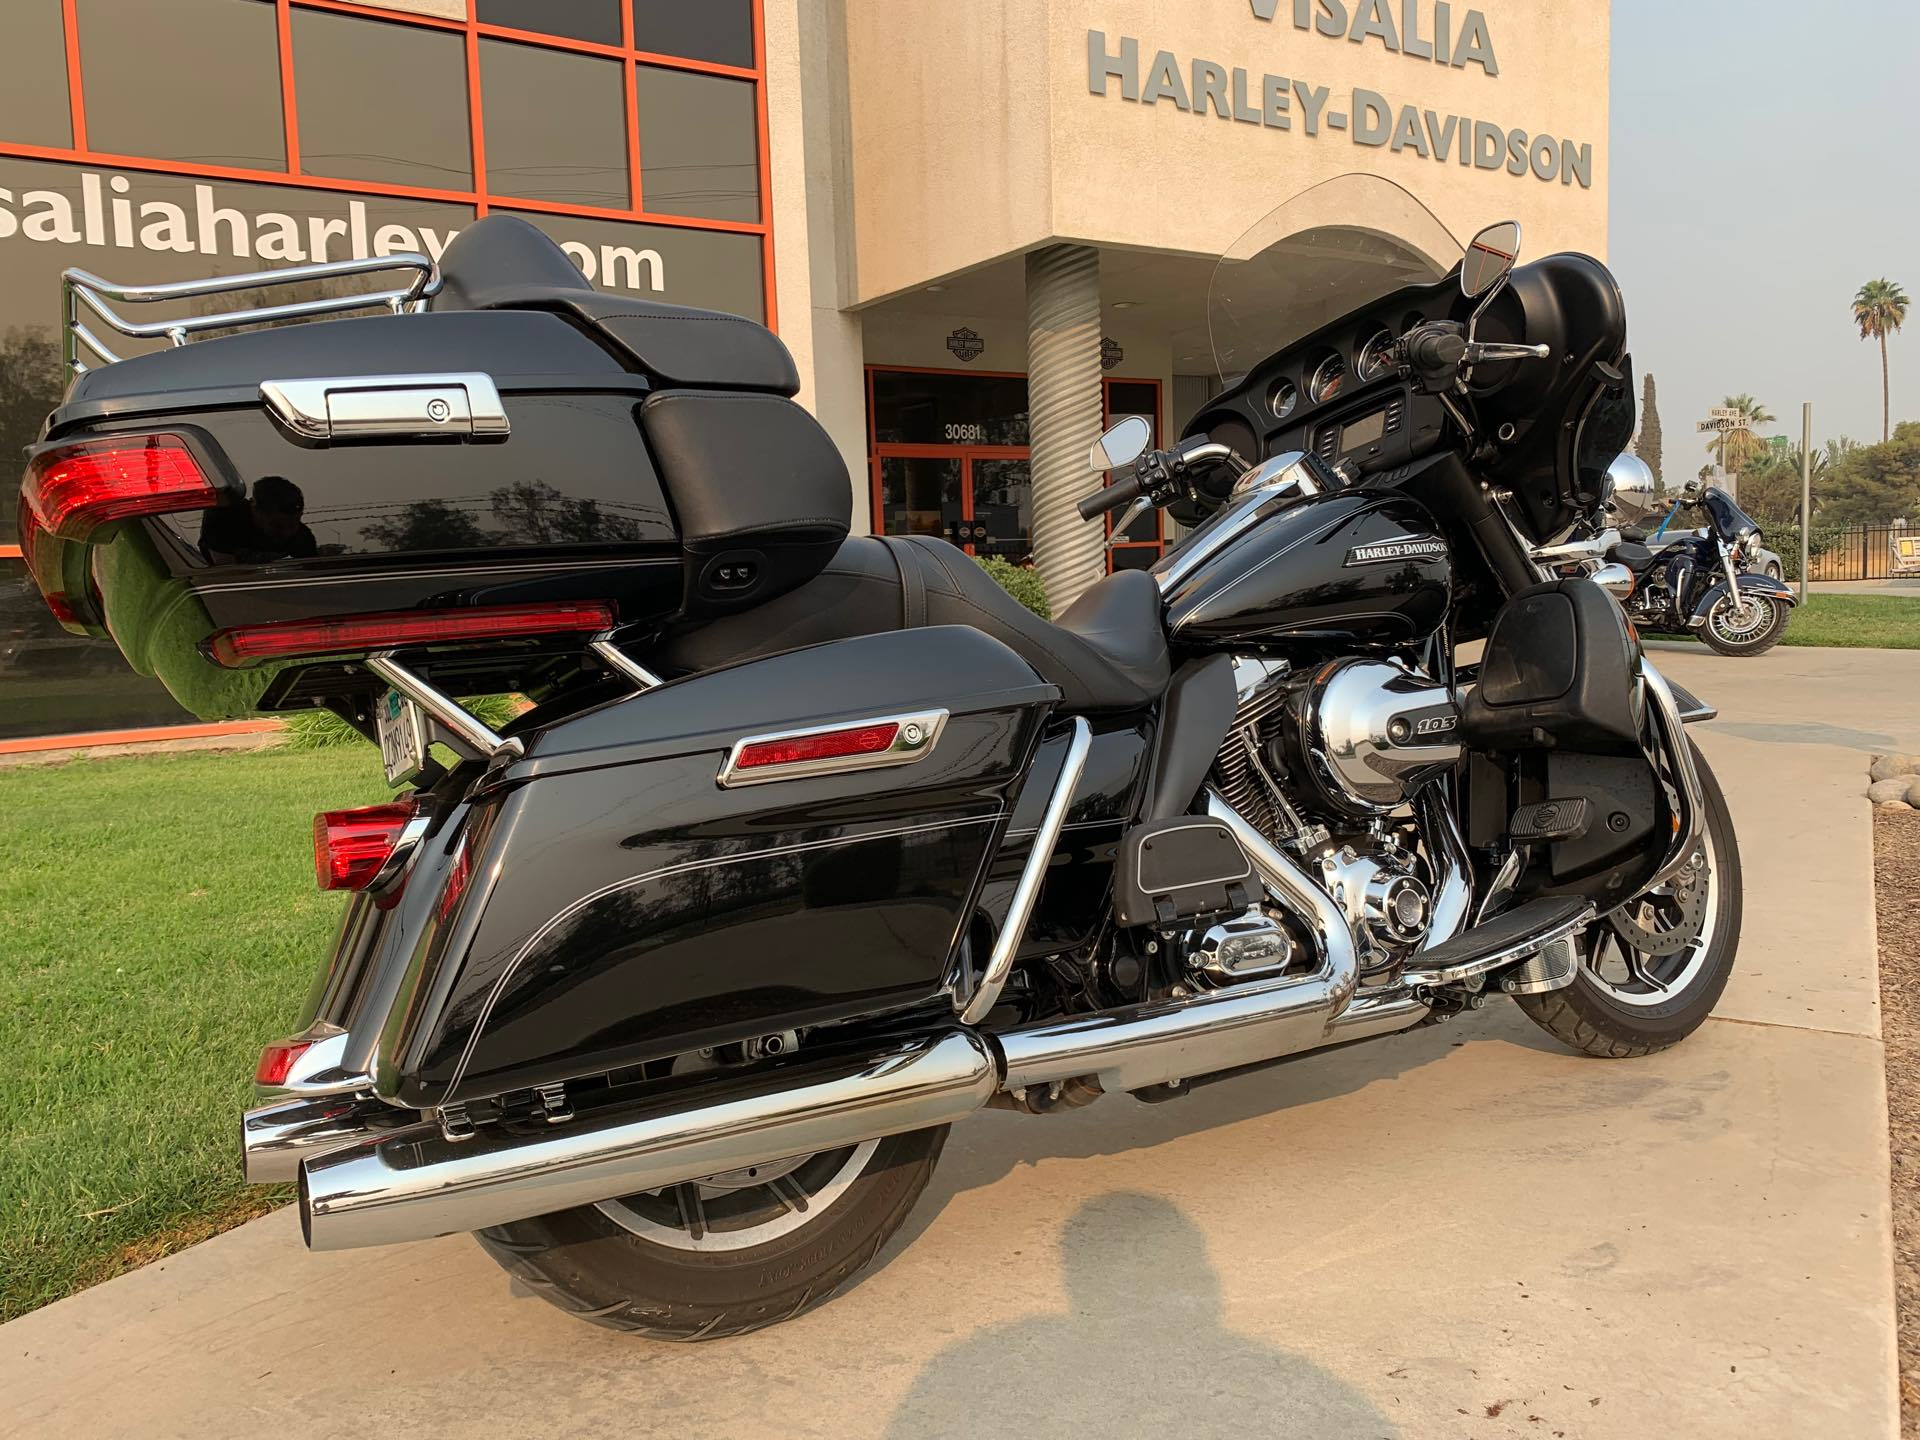 2015 Harley-Davidson Electra Glide Ultra Classic at Visalia Harley-Davidson